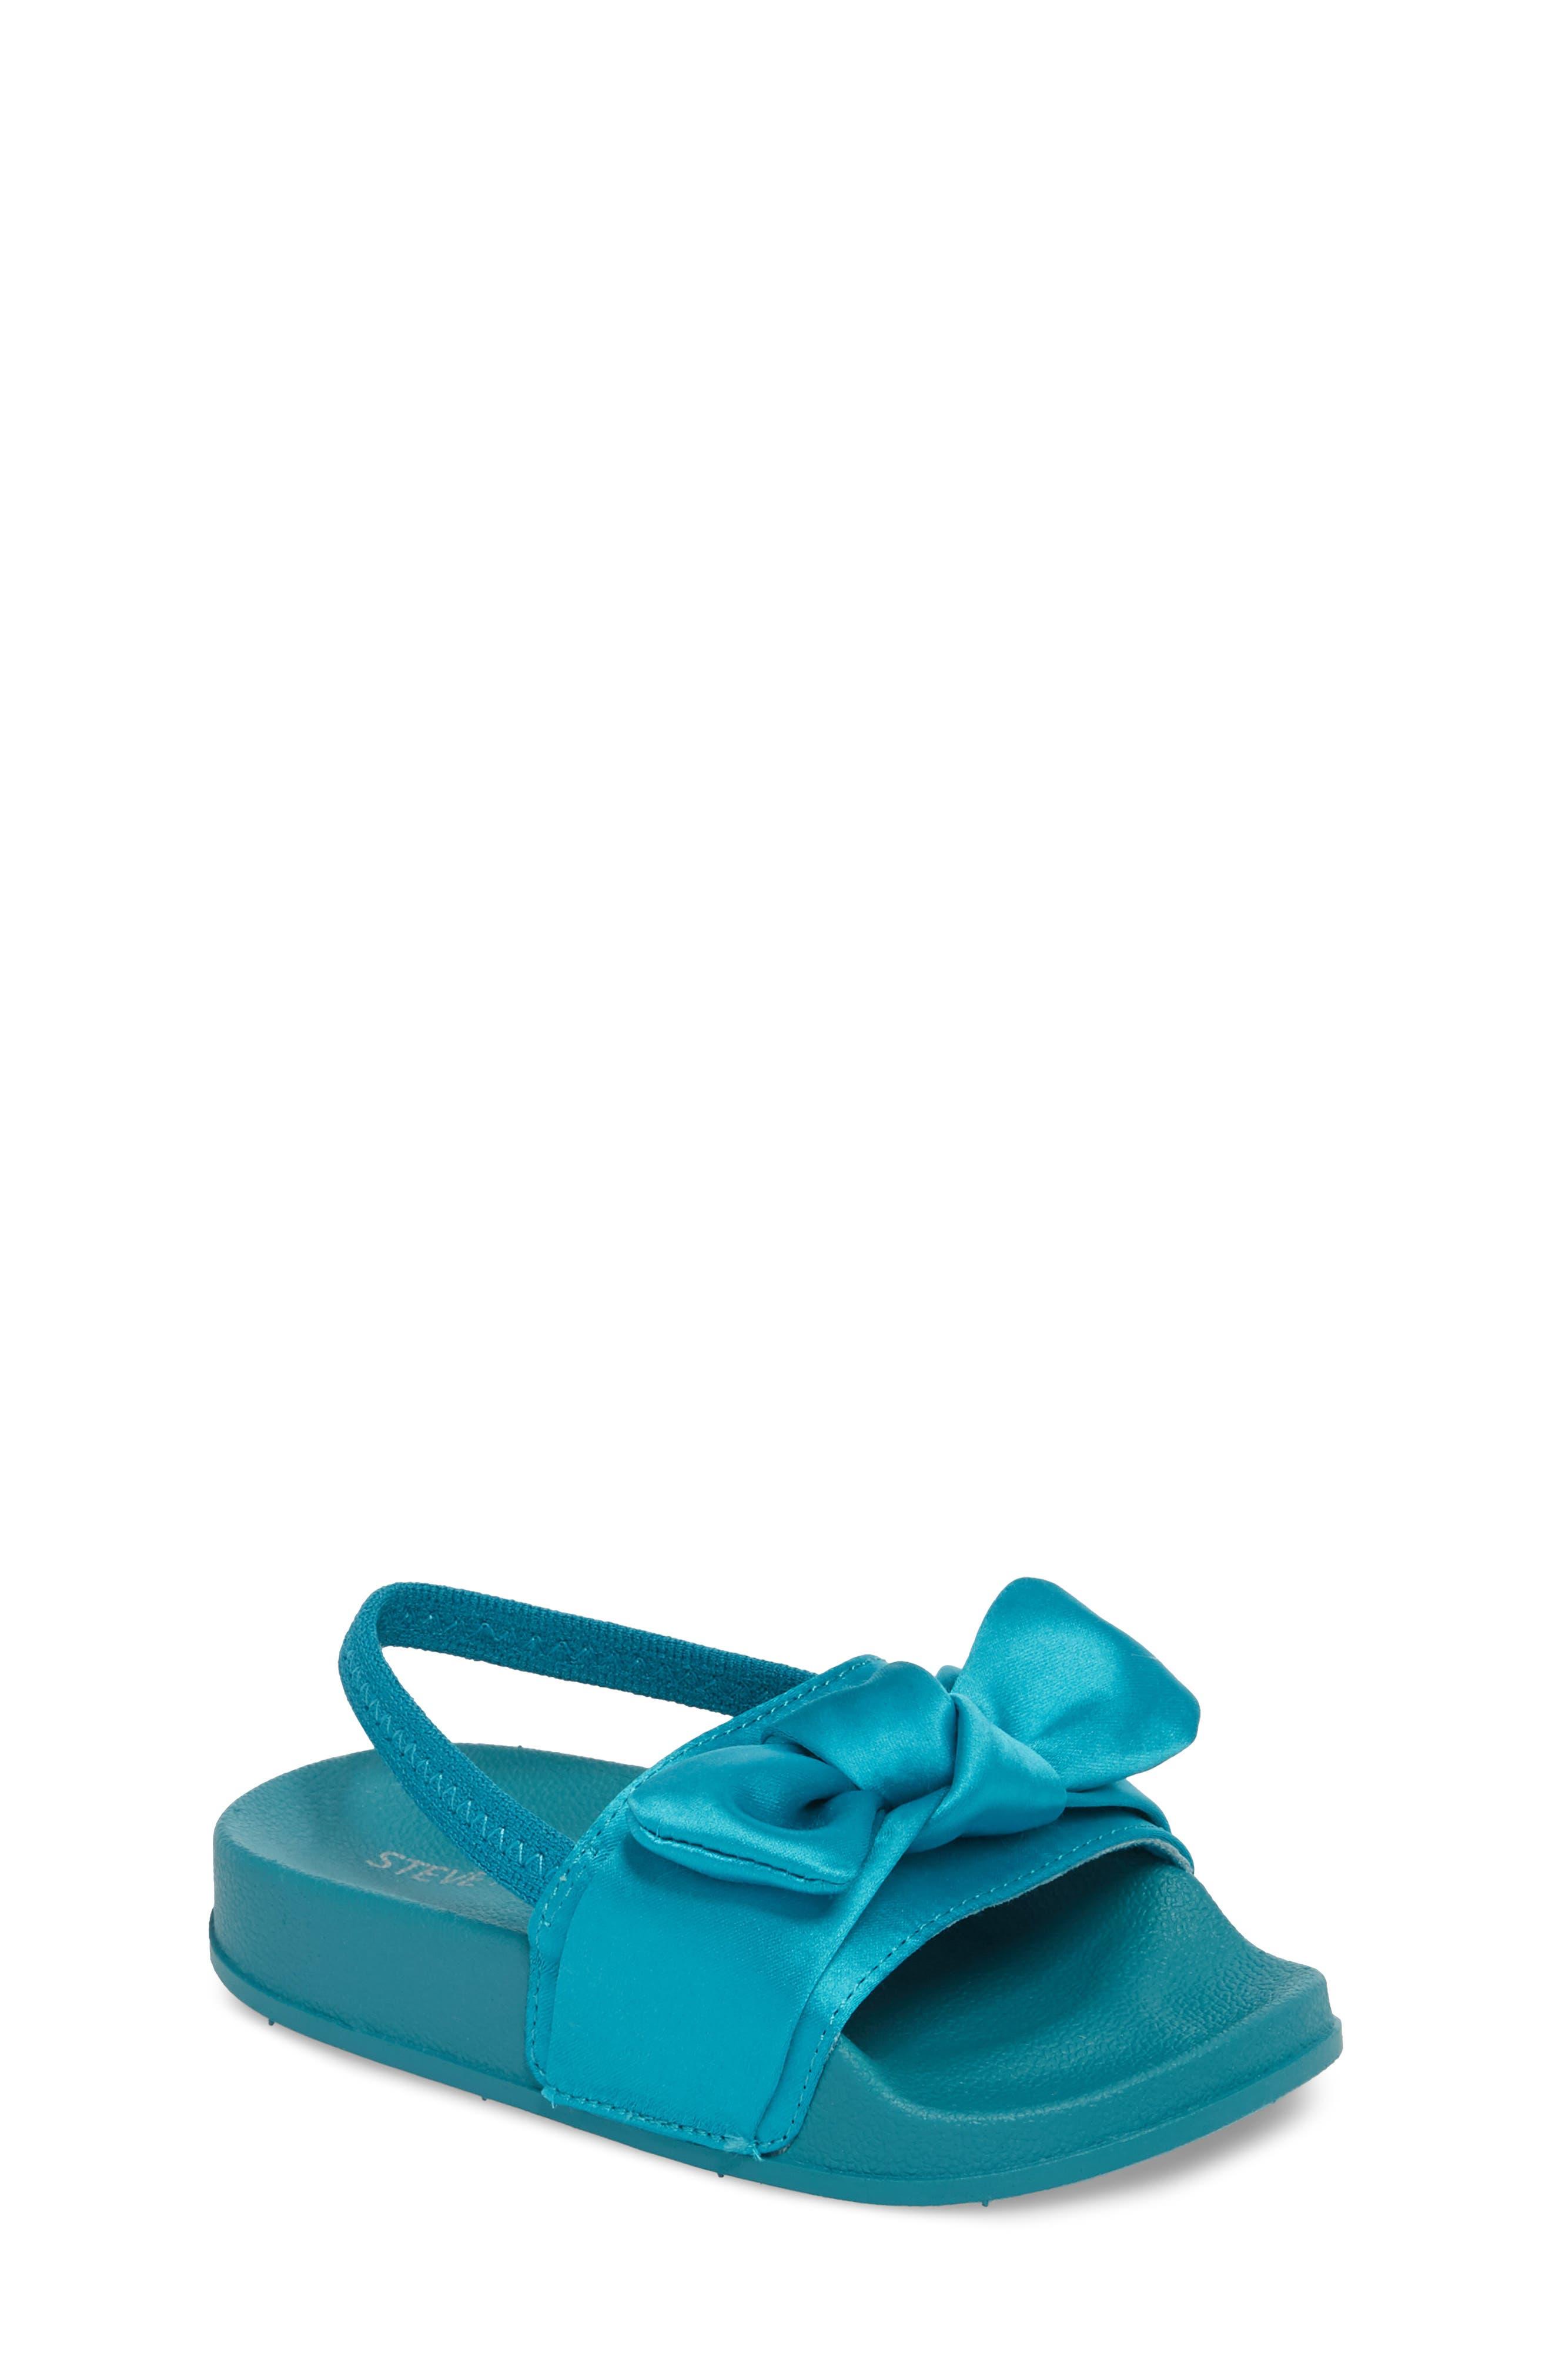 Tsilky Knotted Slide Sandal,                             Main thumbnail 2, color,